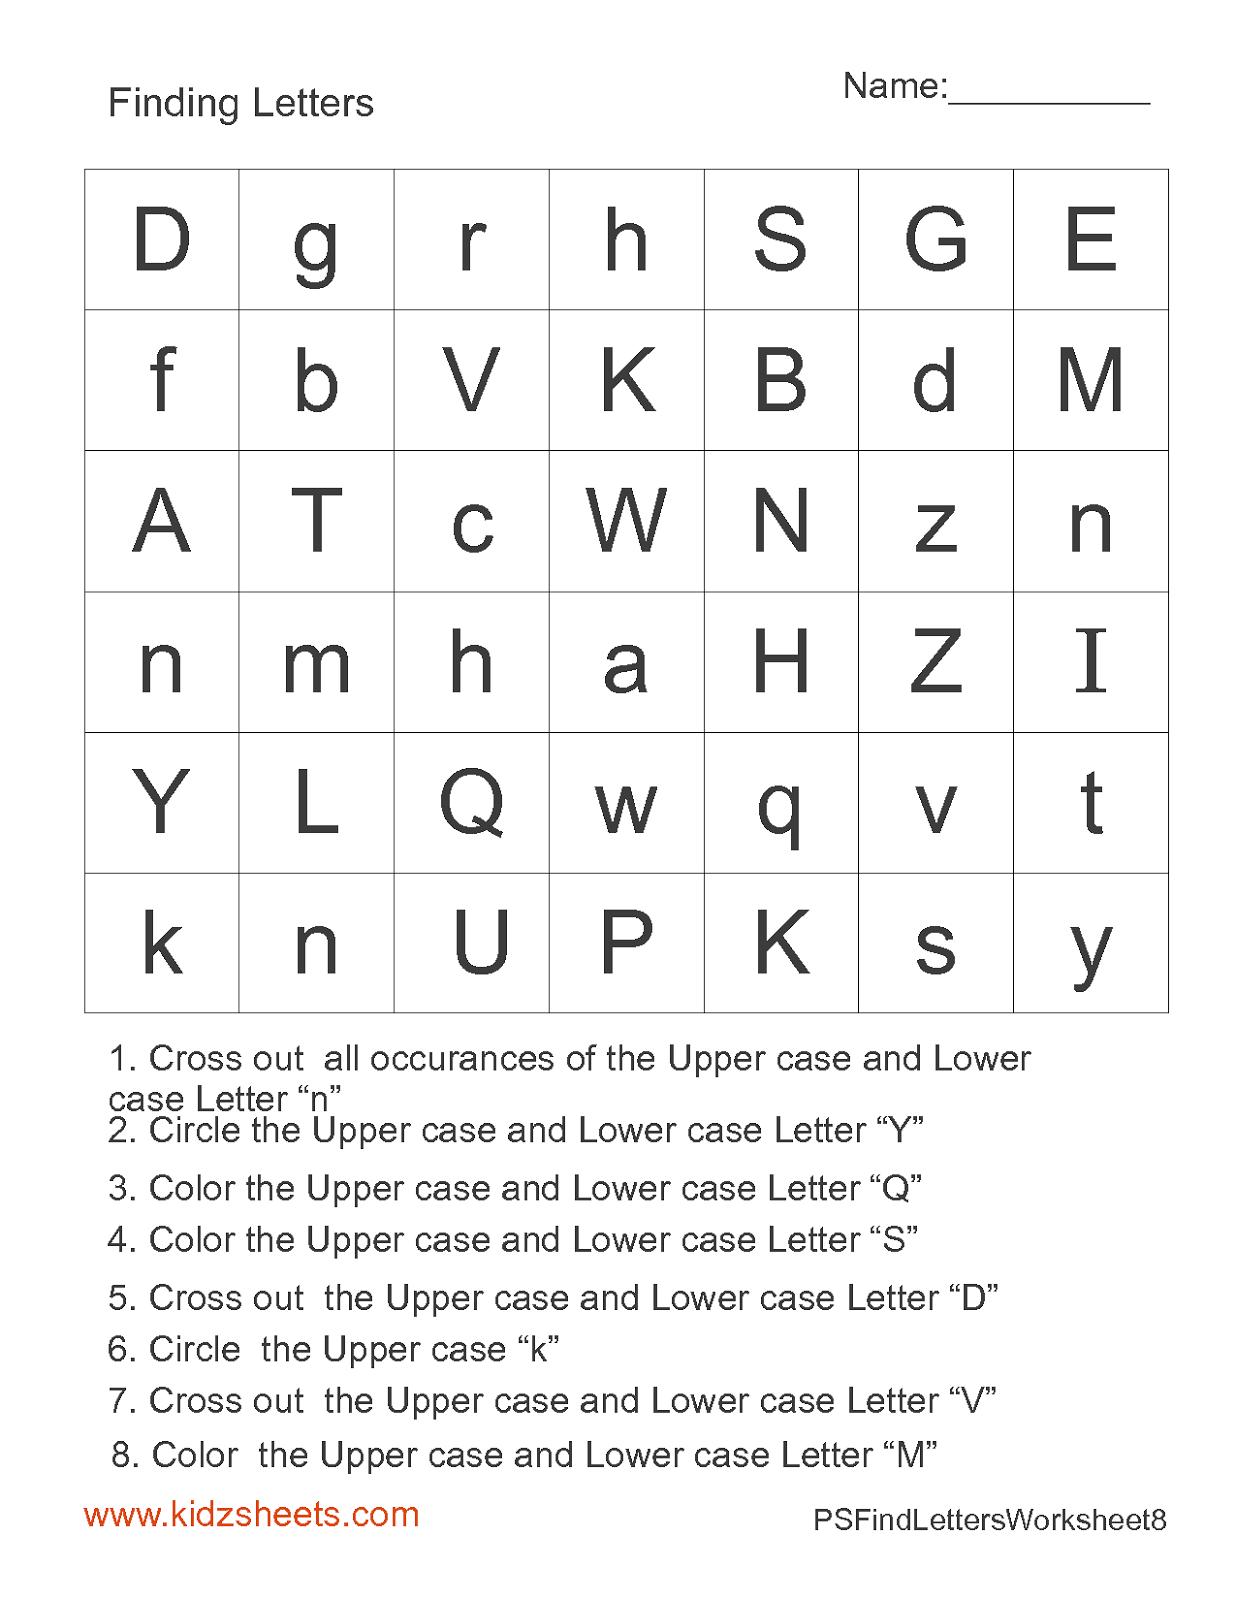 preschool worksheets - Google Search | For kids | Pinterest